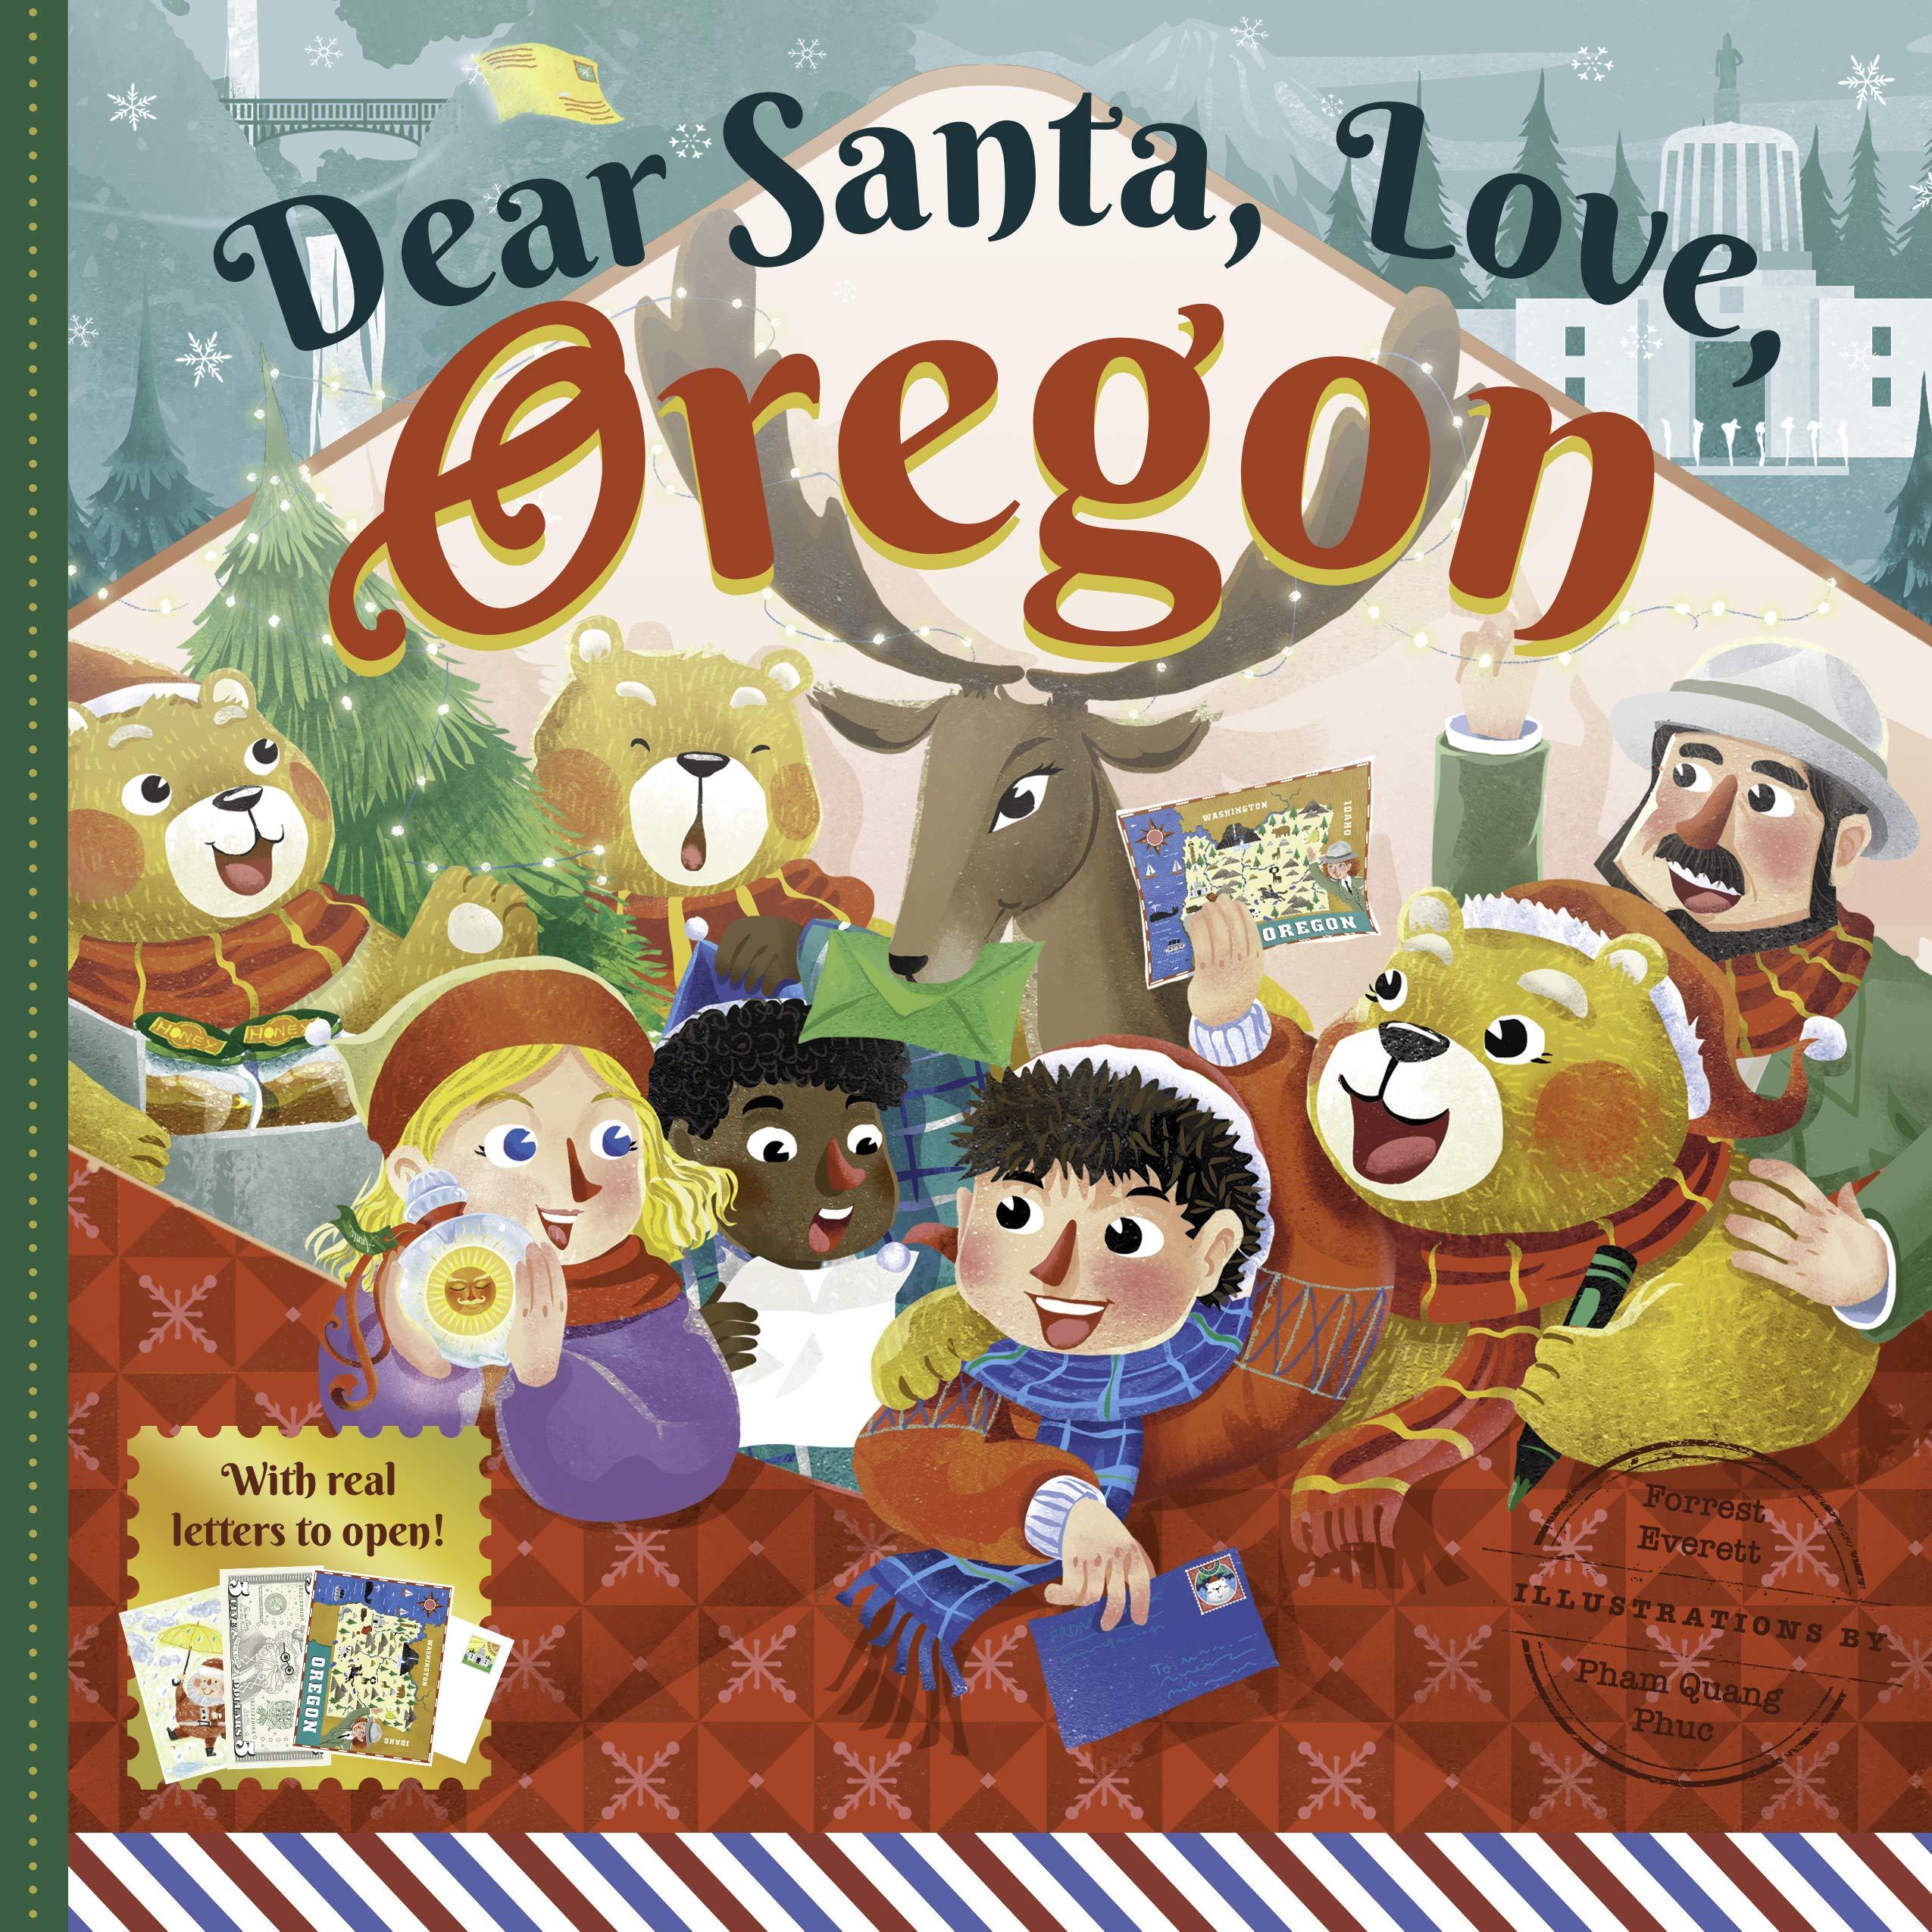 Christmas Celebration Cartoon Images.Dear Santa Love Oregon A Beaver State Christmas